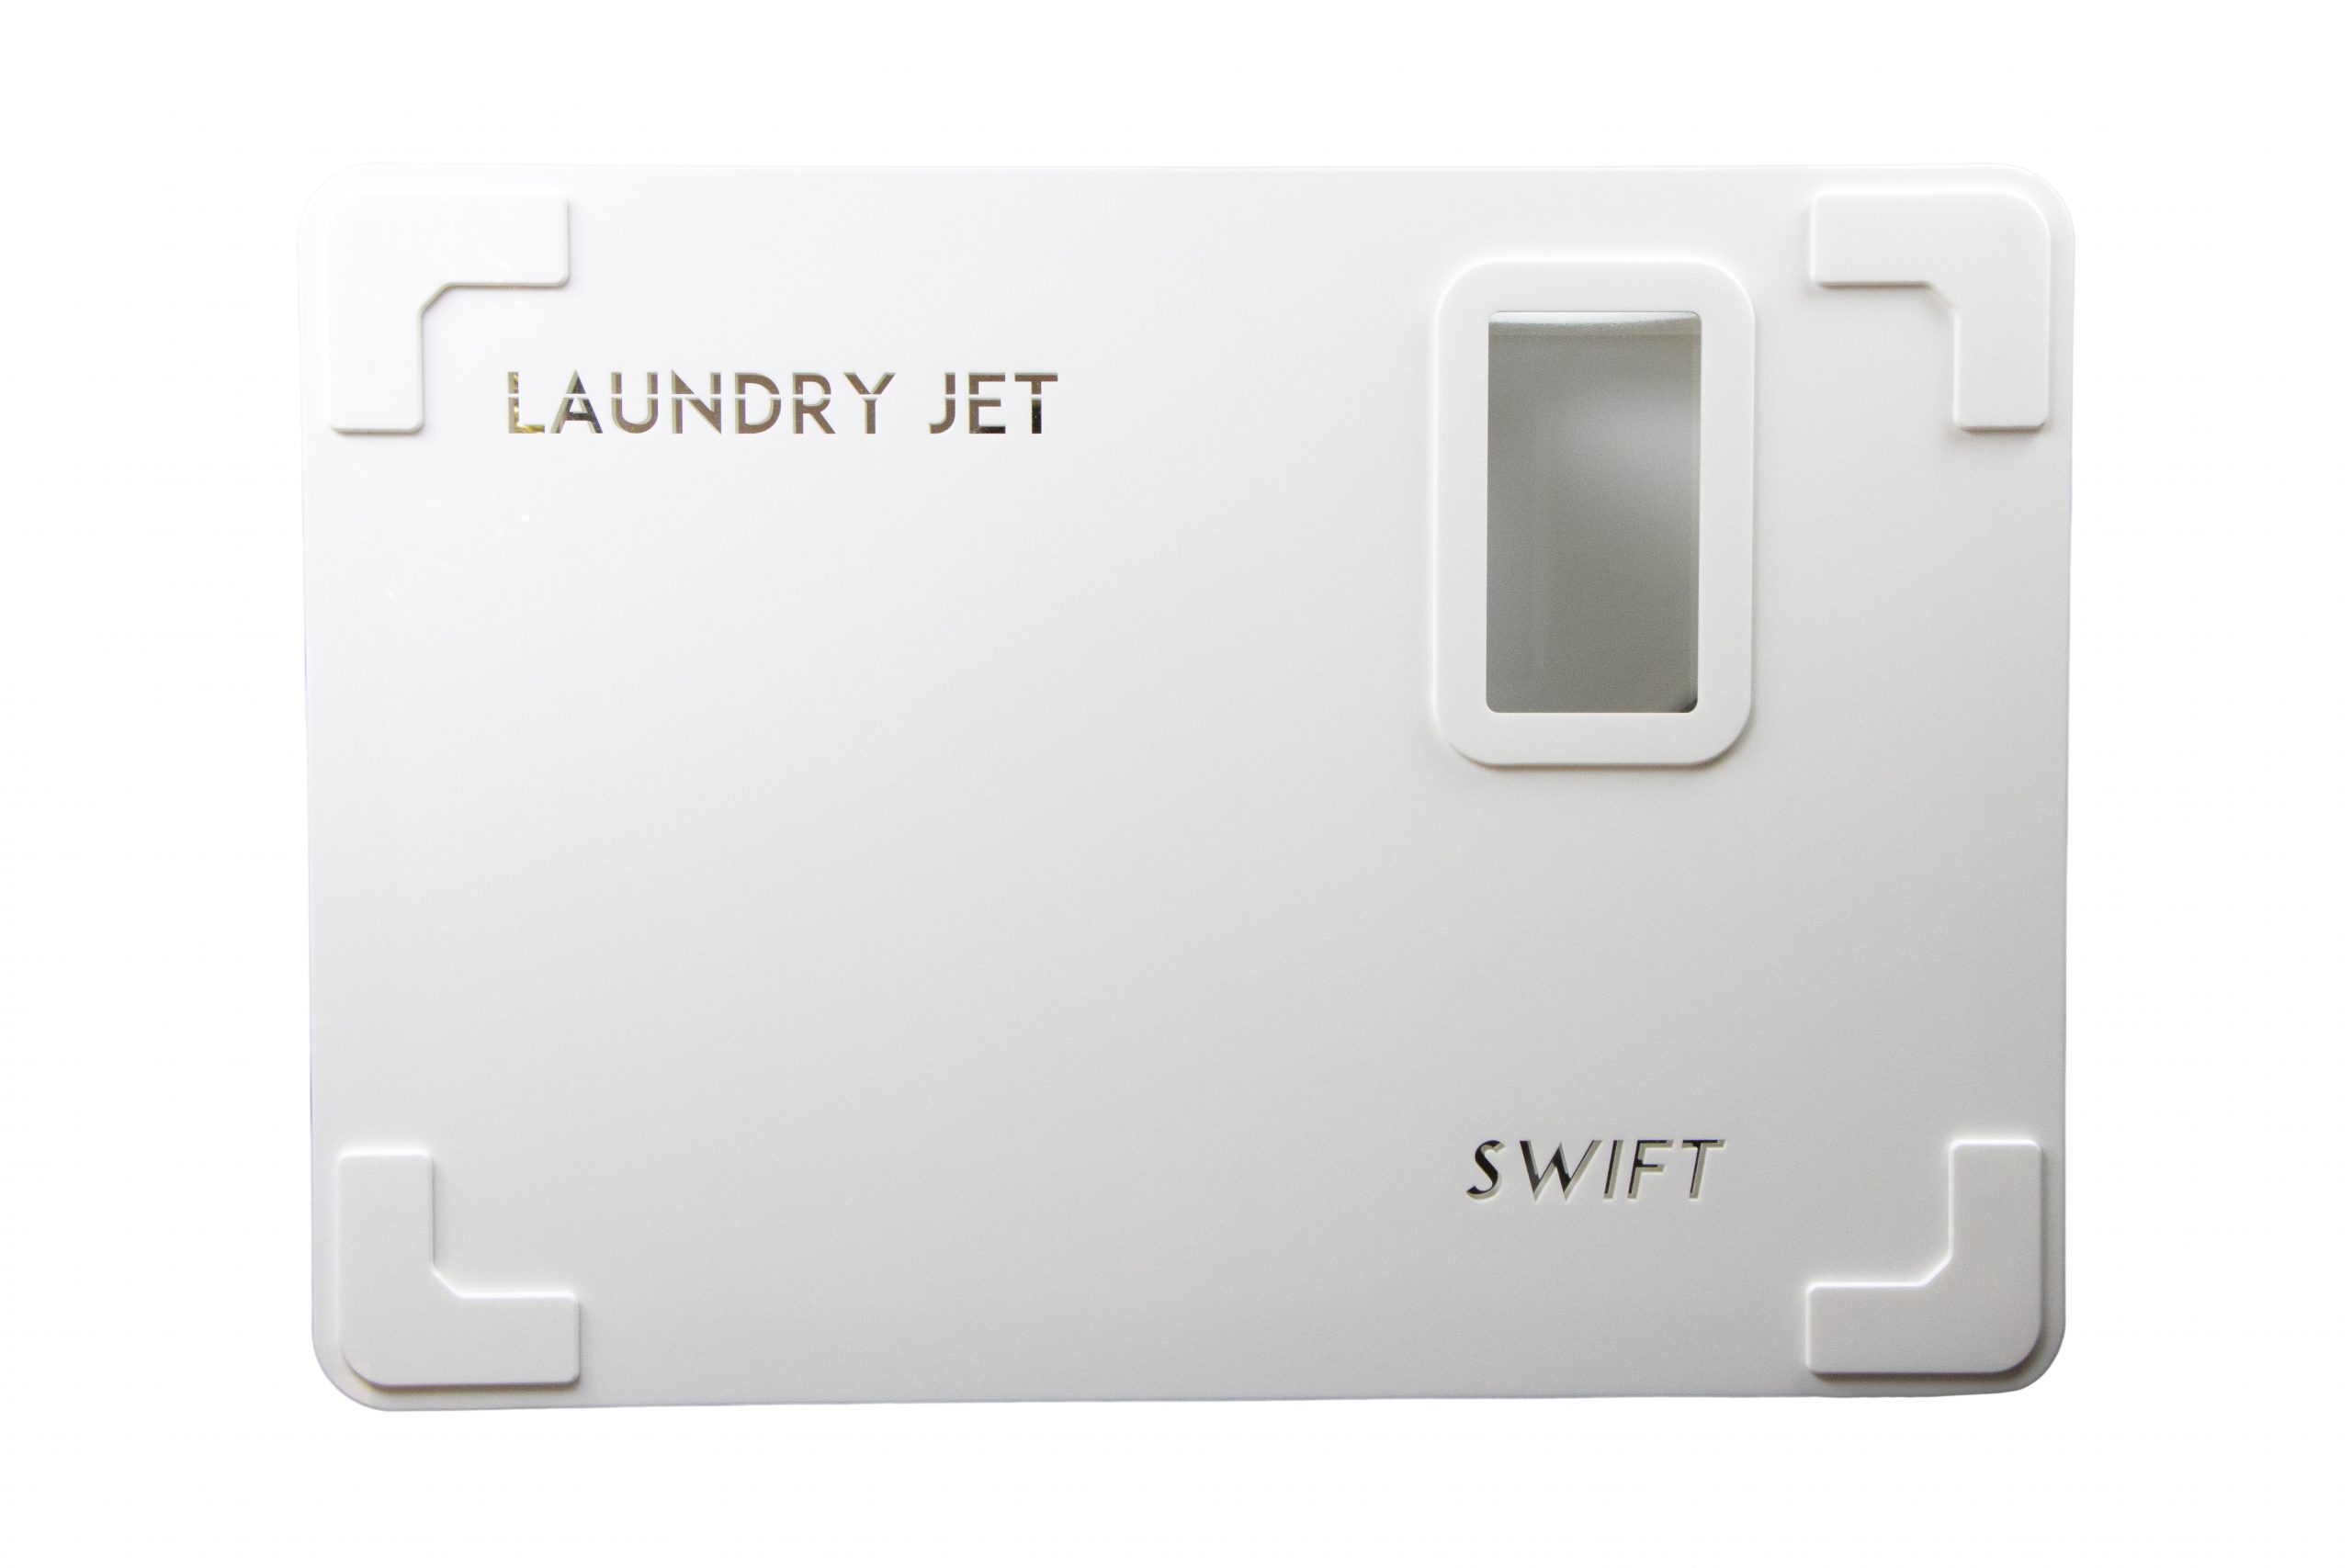 LJ Swift